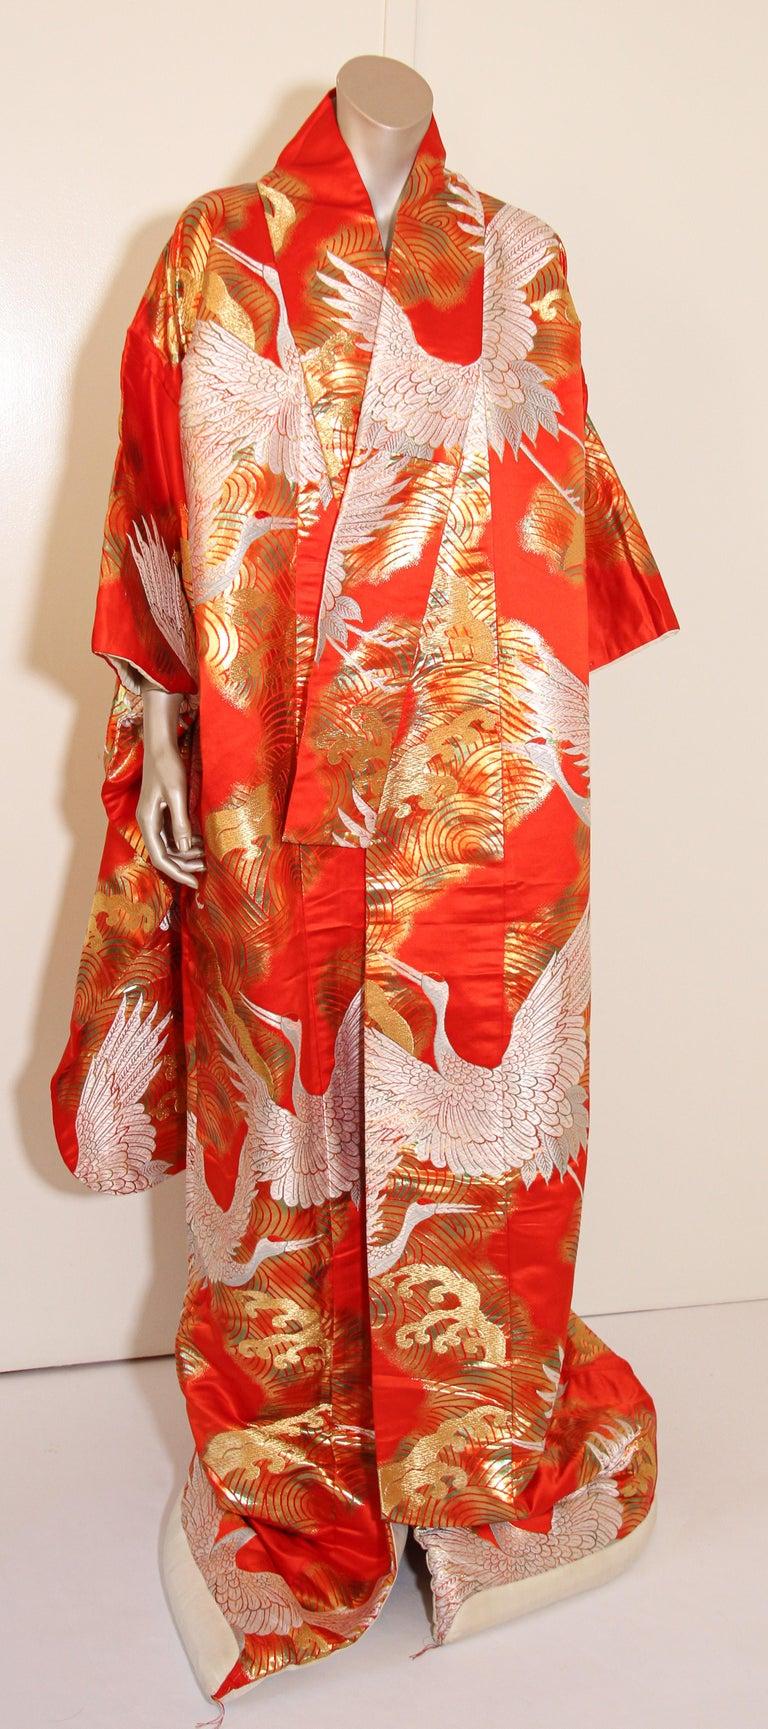 Vintage Red Silk Brocade Japanese Ceremonial Wedding Kimono For Sale 8